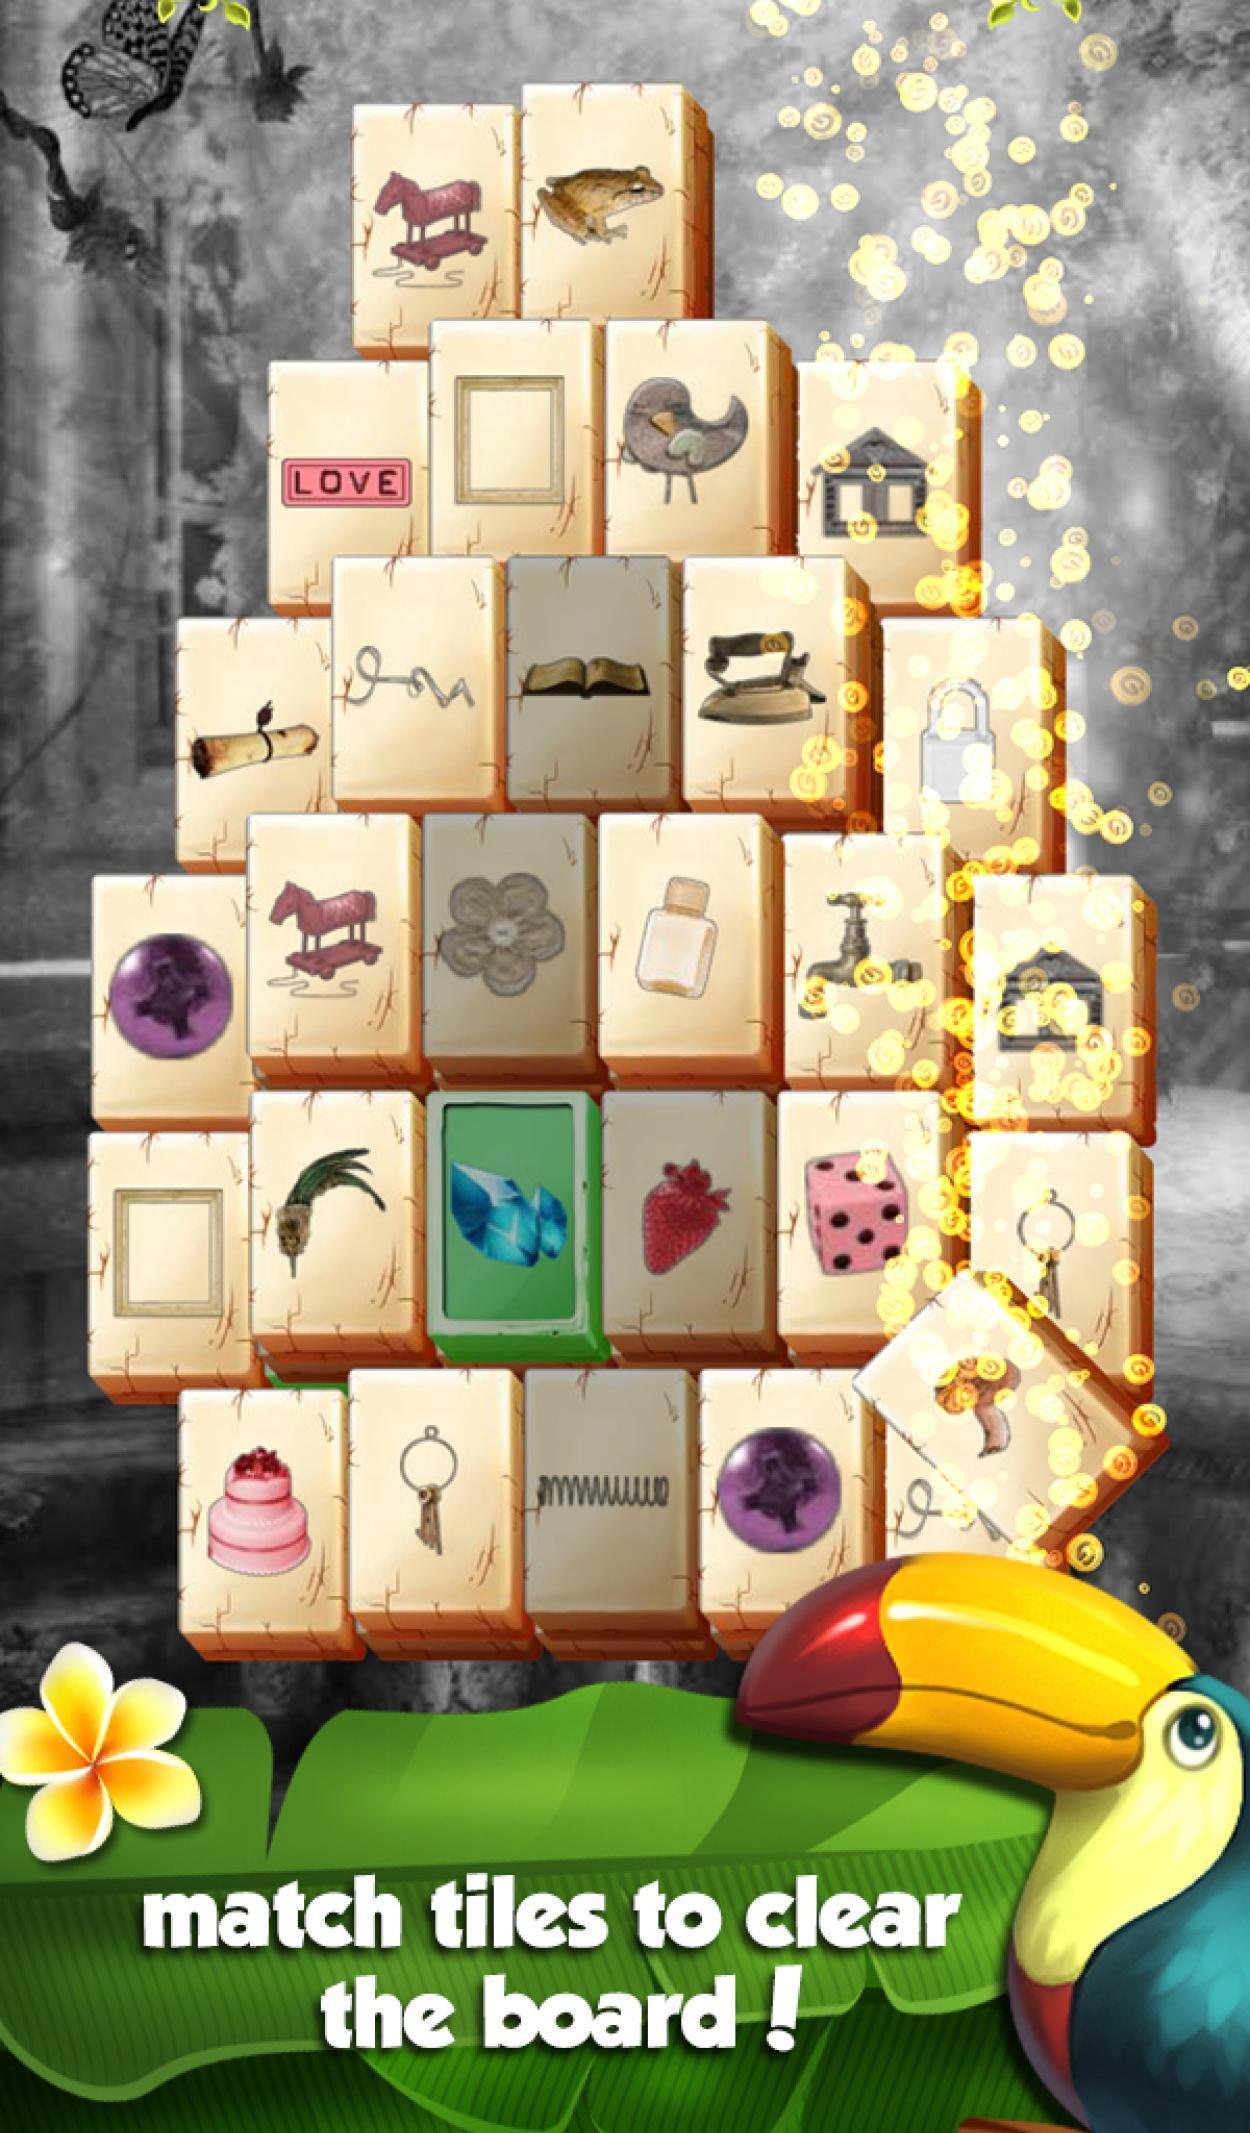 Mahjong World Adventure - The Treasure Trails 1.0.30 Screenshot 7